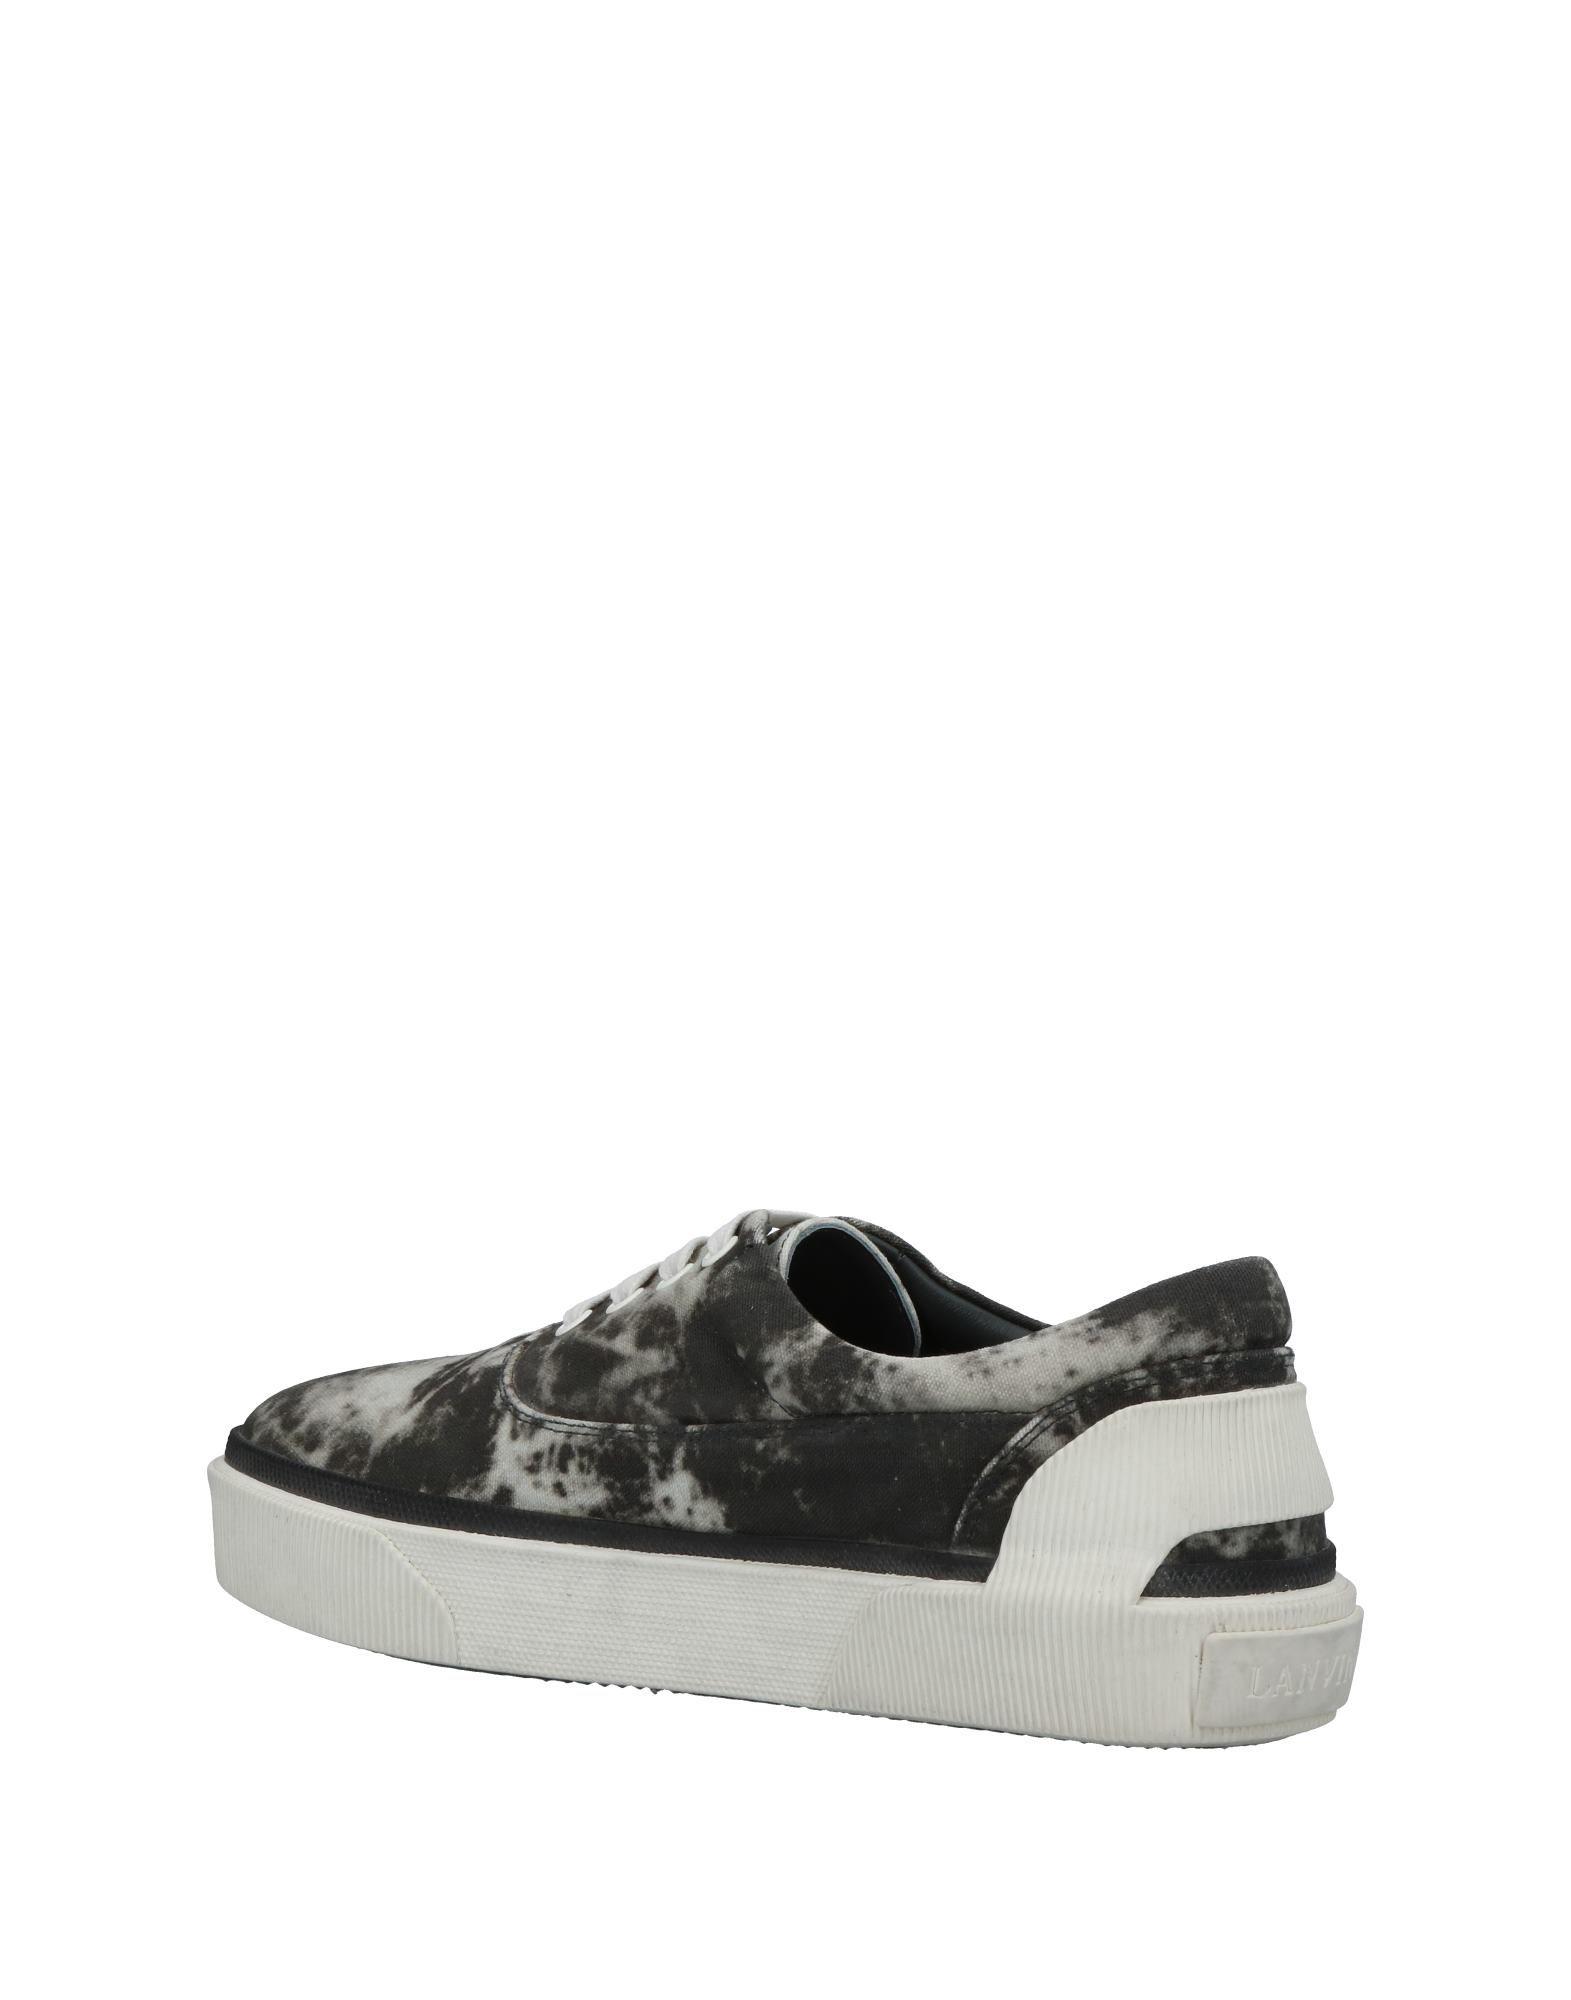 Lanvin Sneakers Herren  beliebte 11365220IO Gute Qualität beliebte  Schuhe 75e520